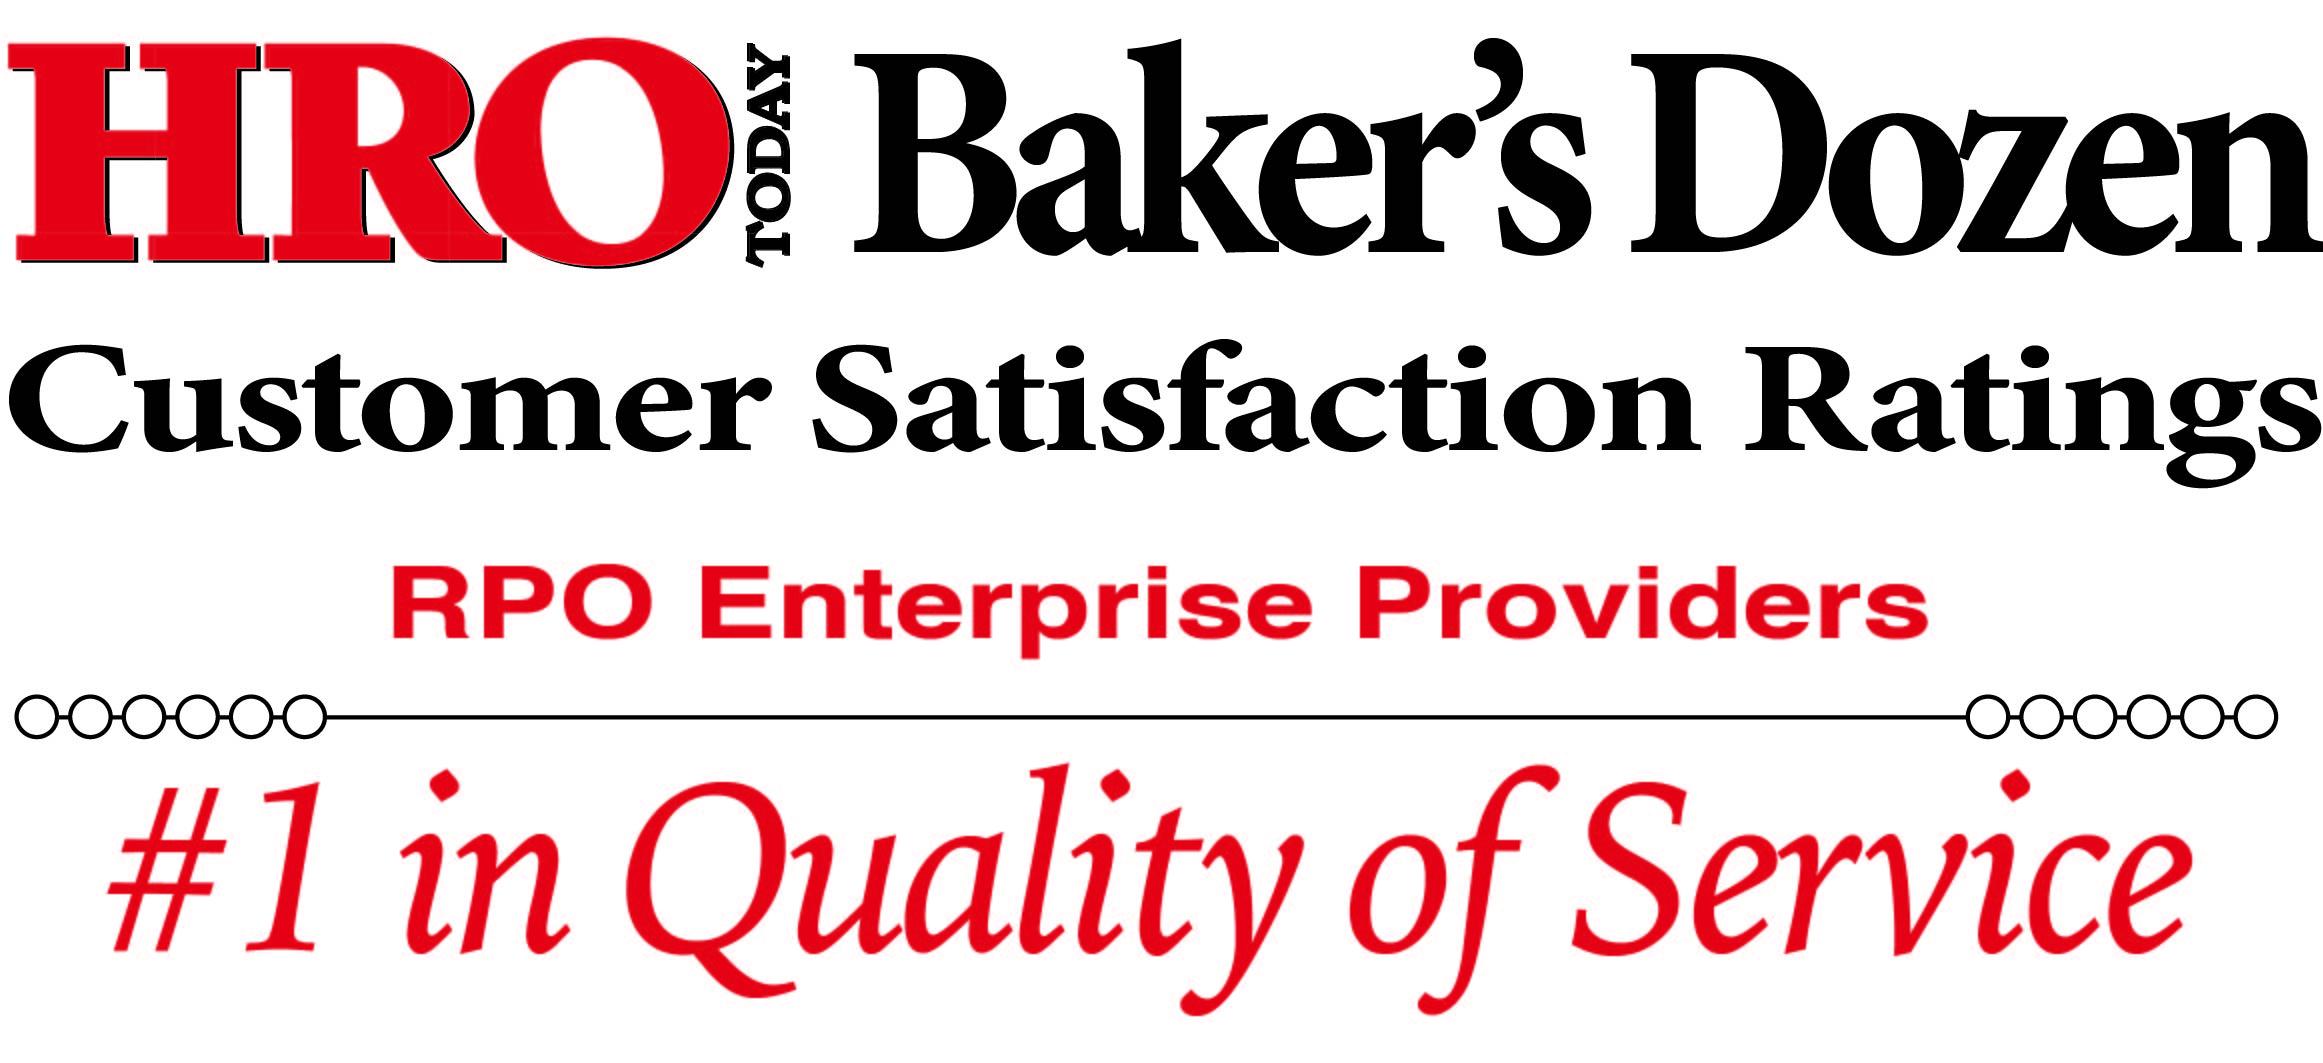 HRO Today 2020 RPO Baker's Dozen best RPO companies